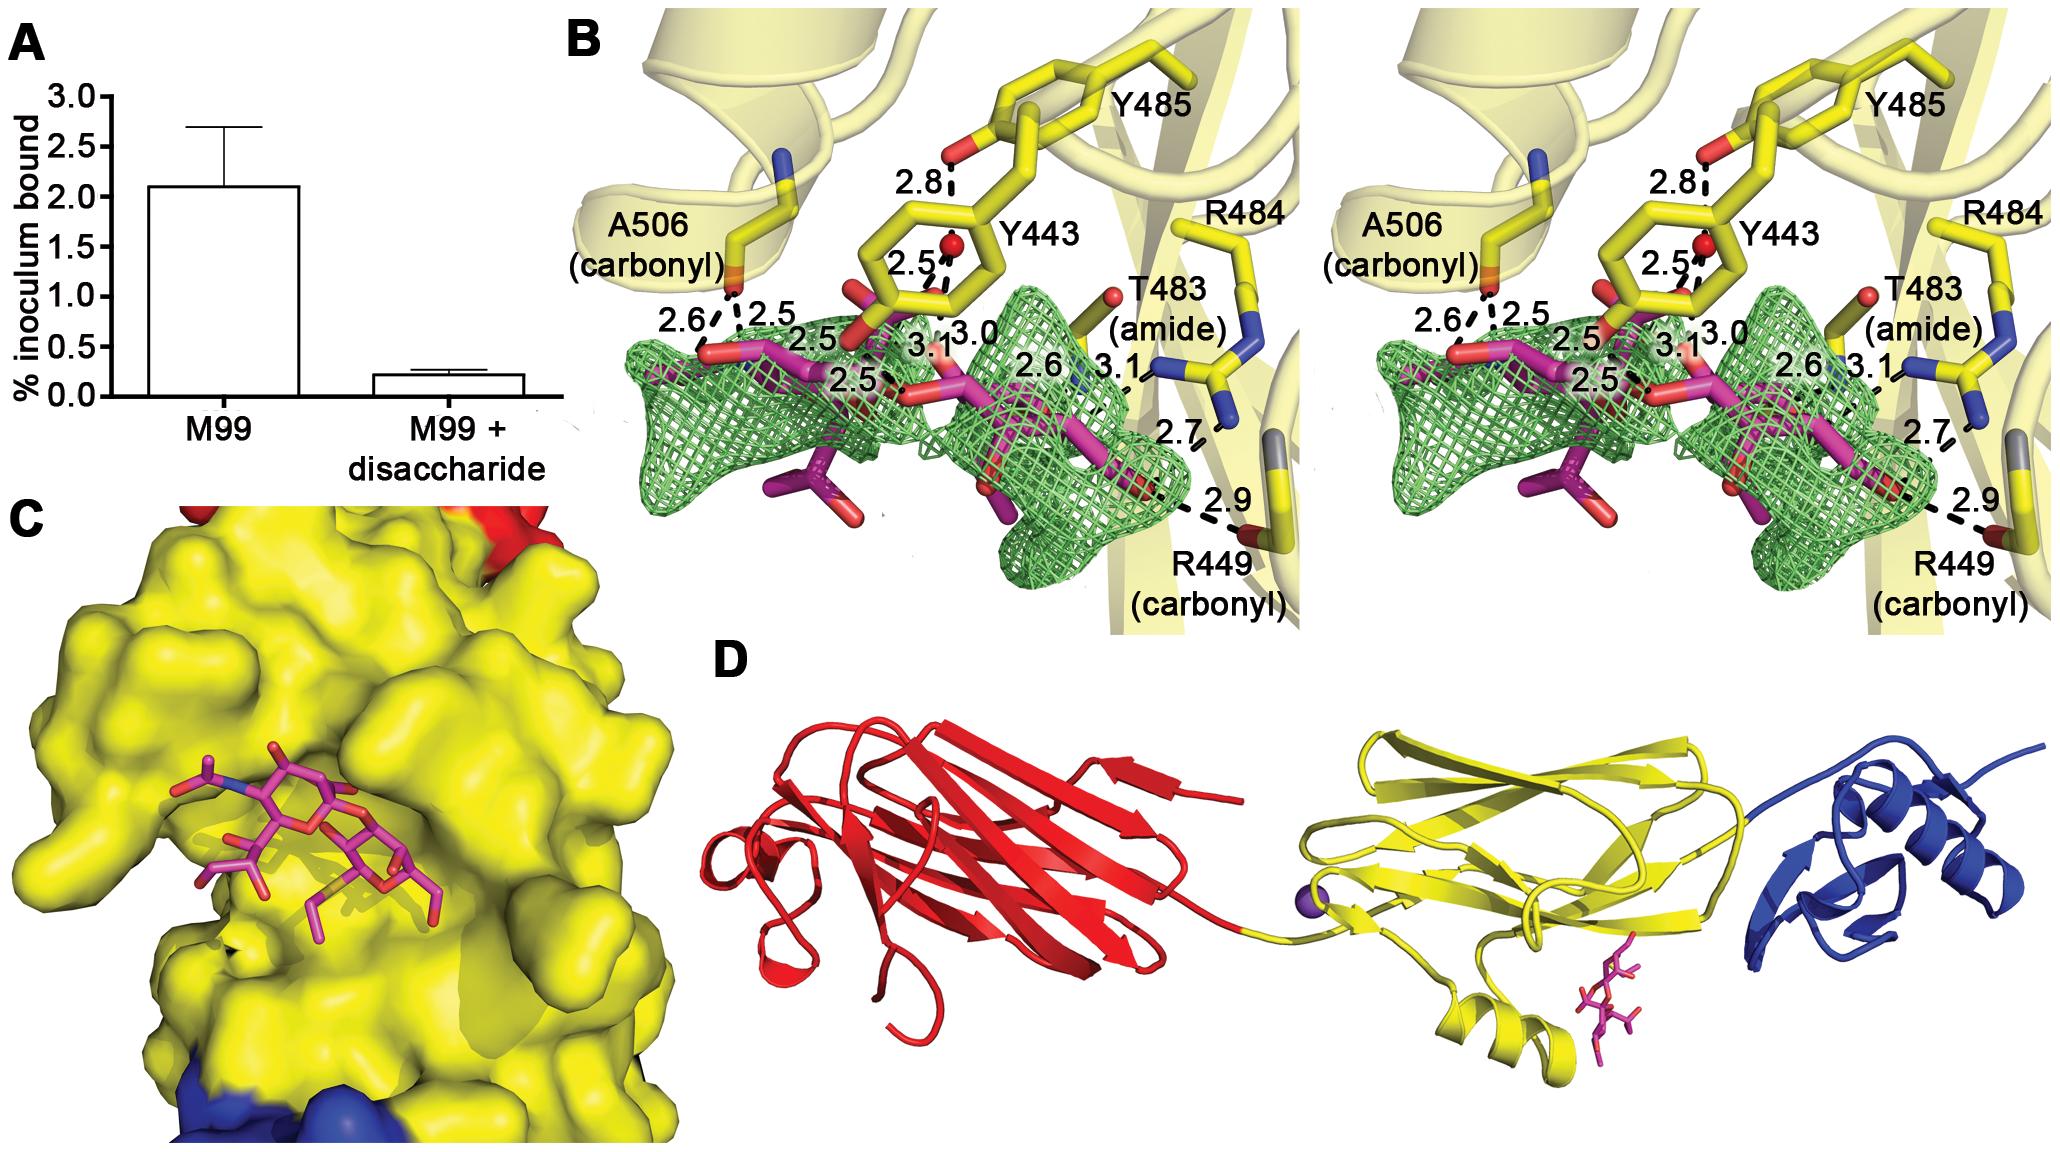 Identification of the receptor binding site.